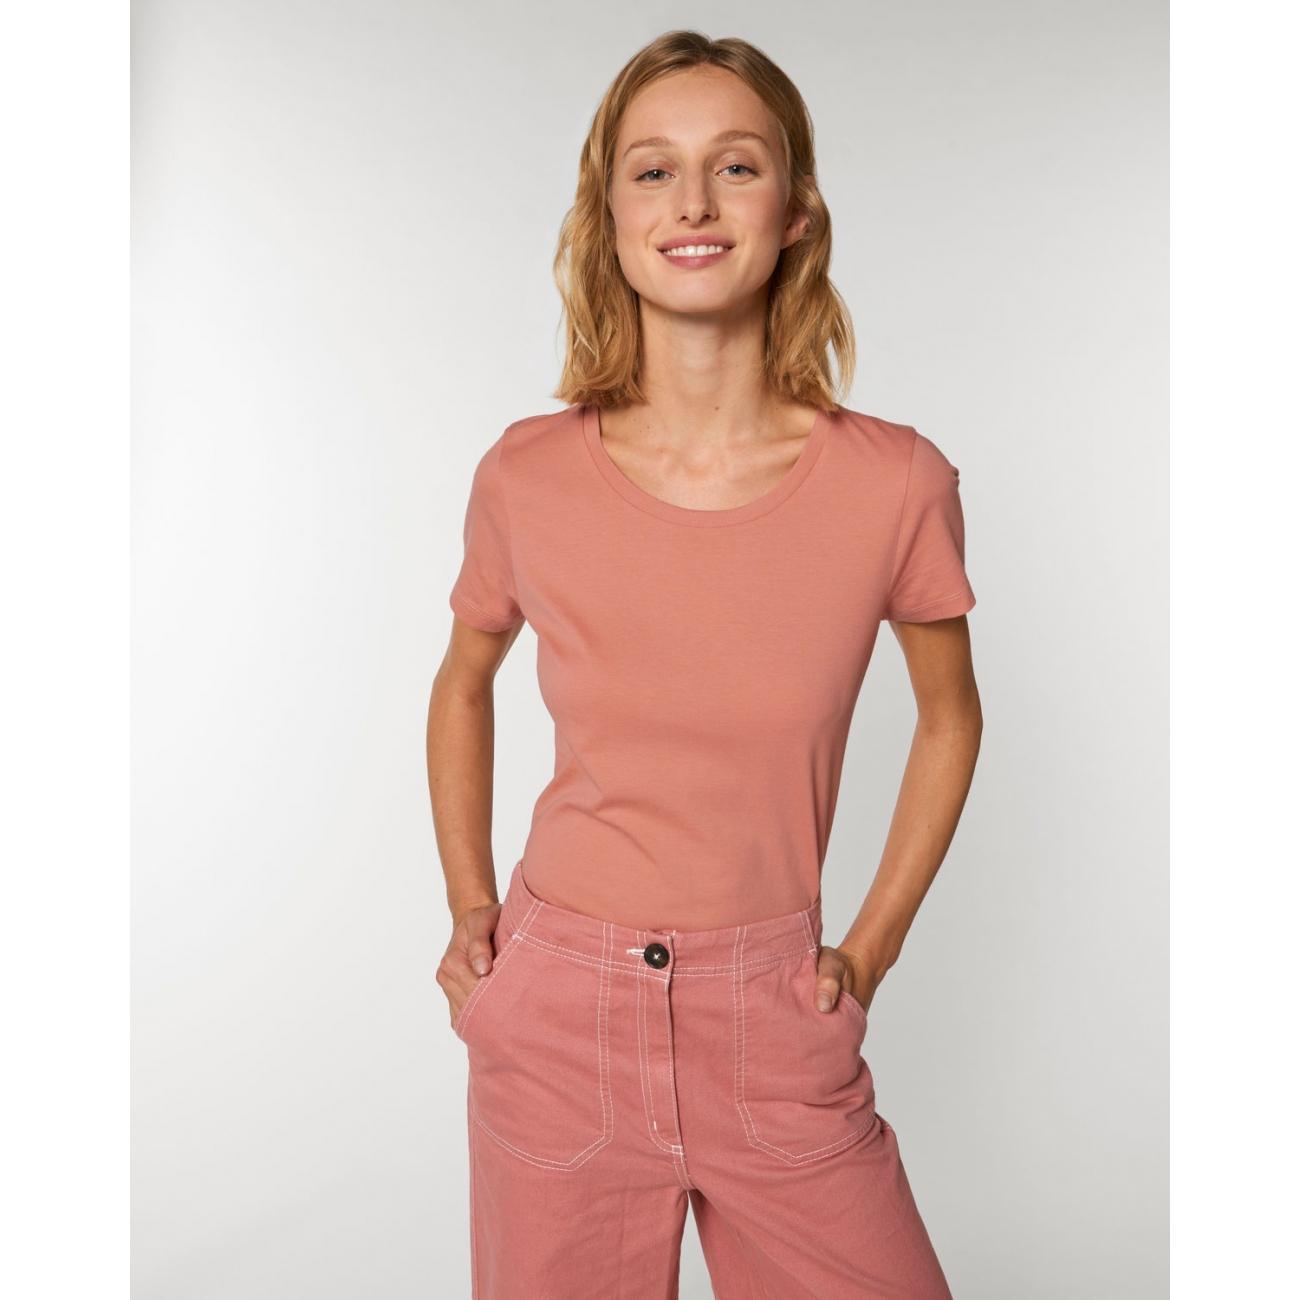 https://tee-shirt-bio.com/10200-thickbox_default/tee-shirt-femme-coton-bio-coupe-feminine-et-cintree-rose-peche.jpg